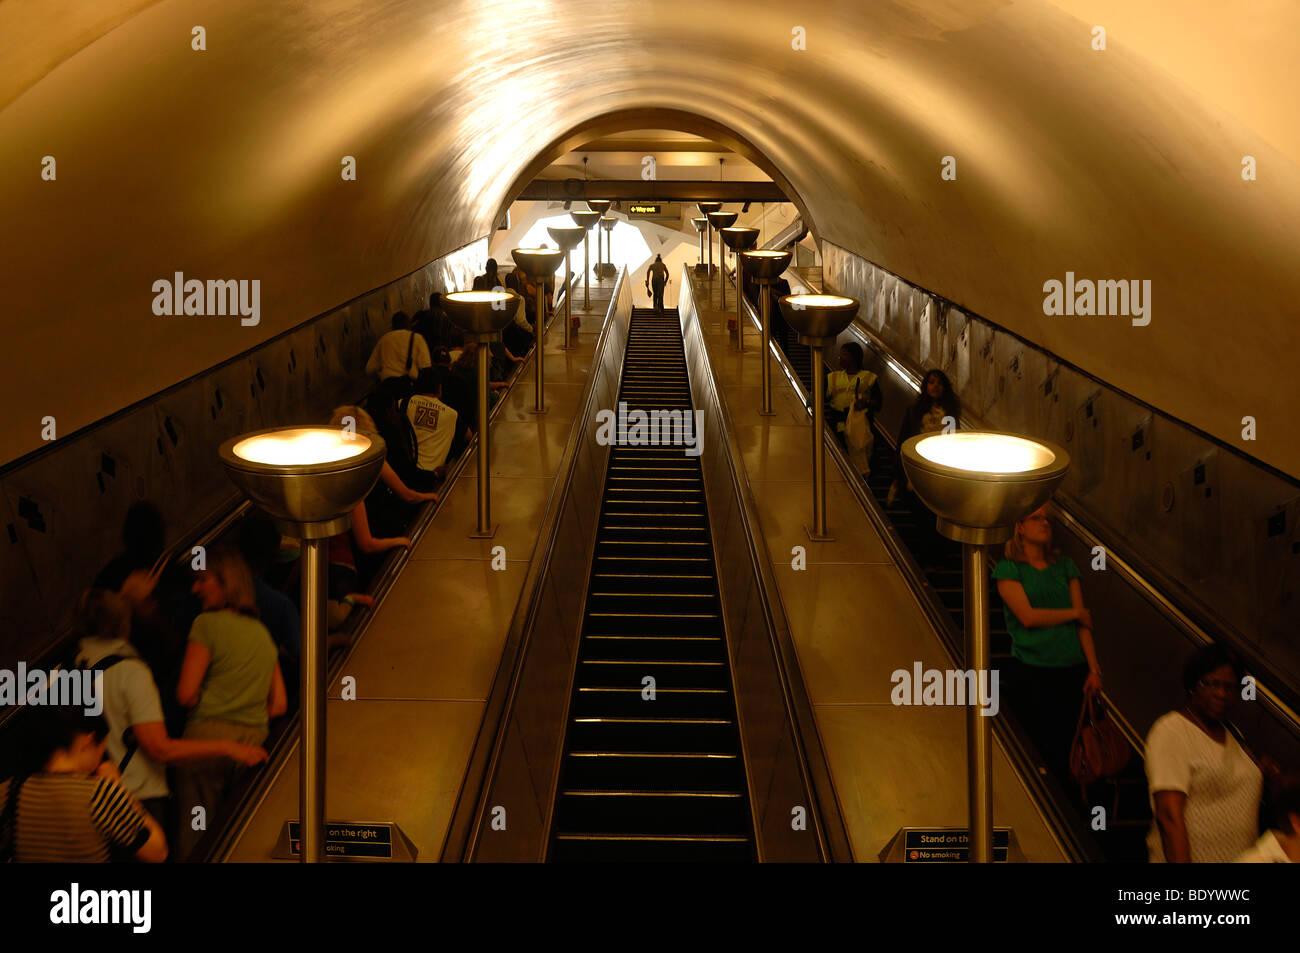 Escalators in the subway, Tooting Broadway, London, England, United Kingdom, Europe - Stock Image